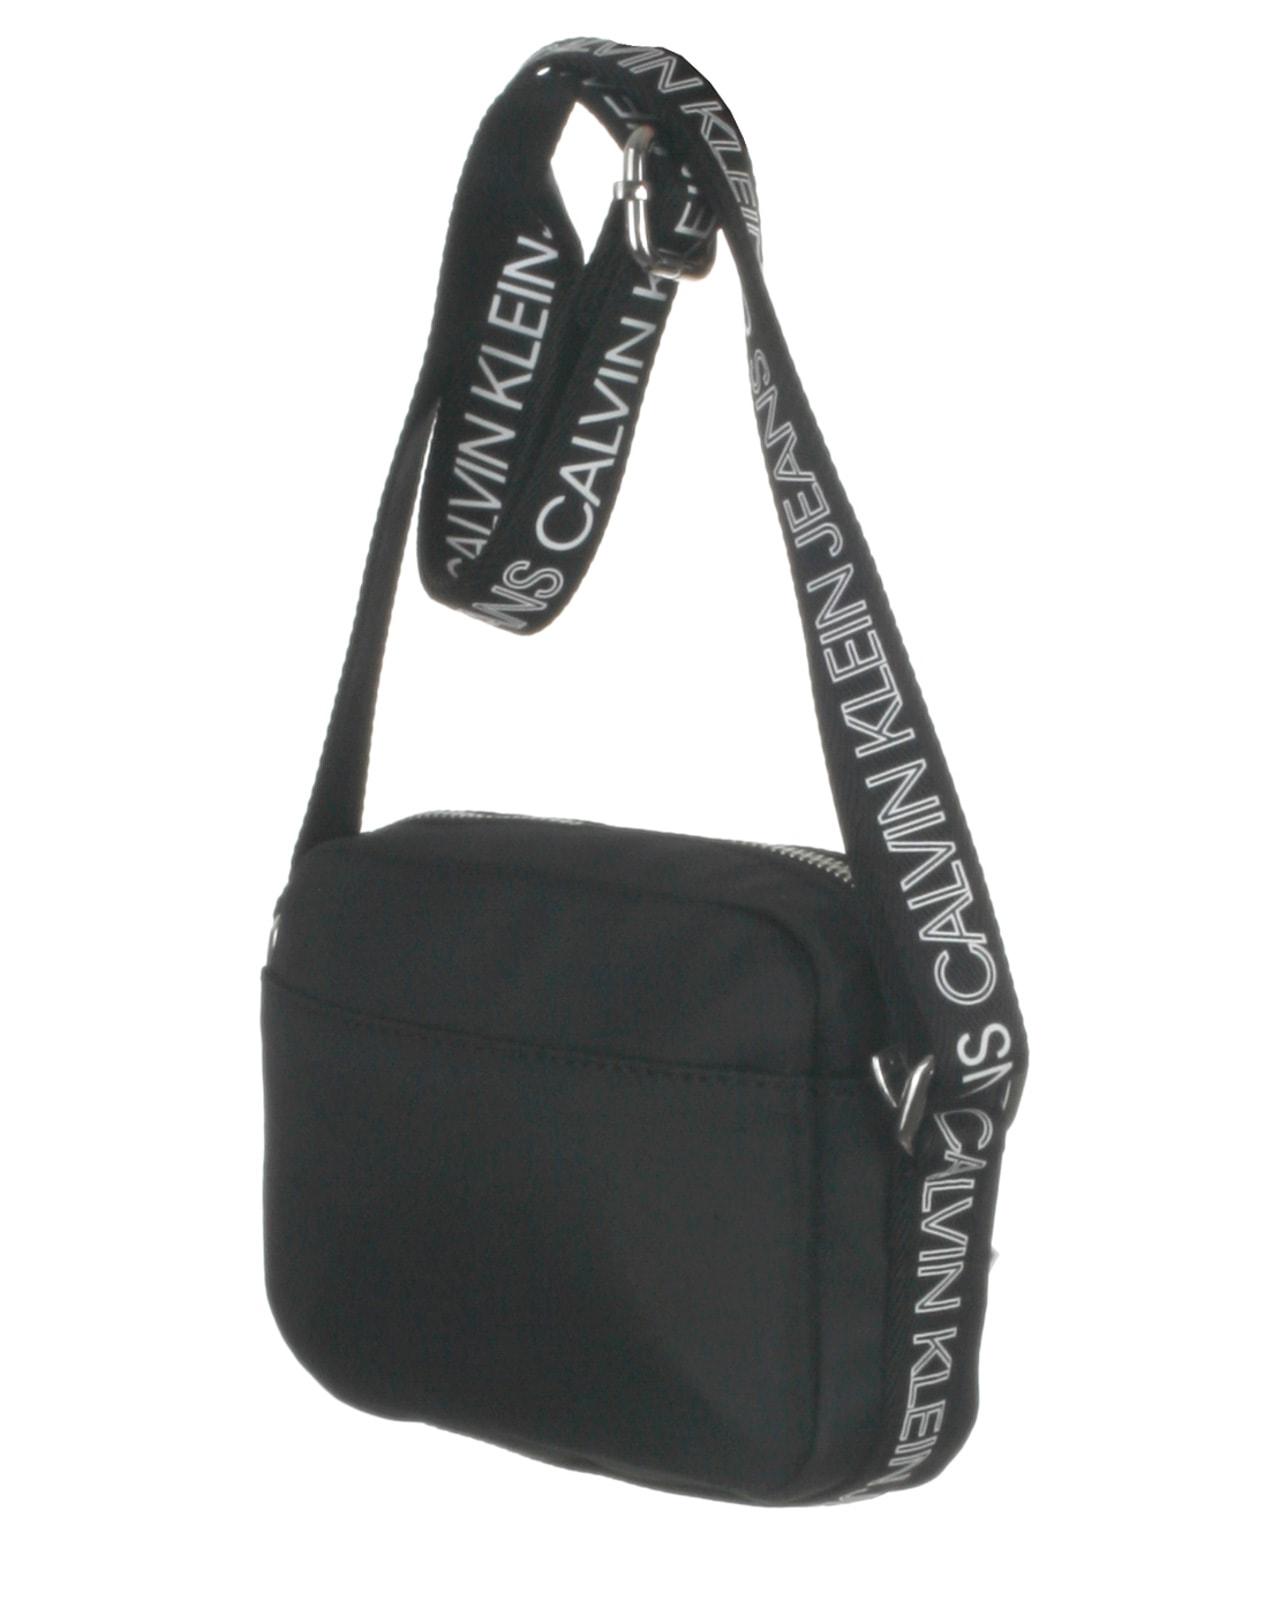 Image of Calvin Klein cross bag, black